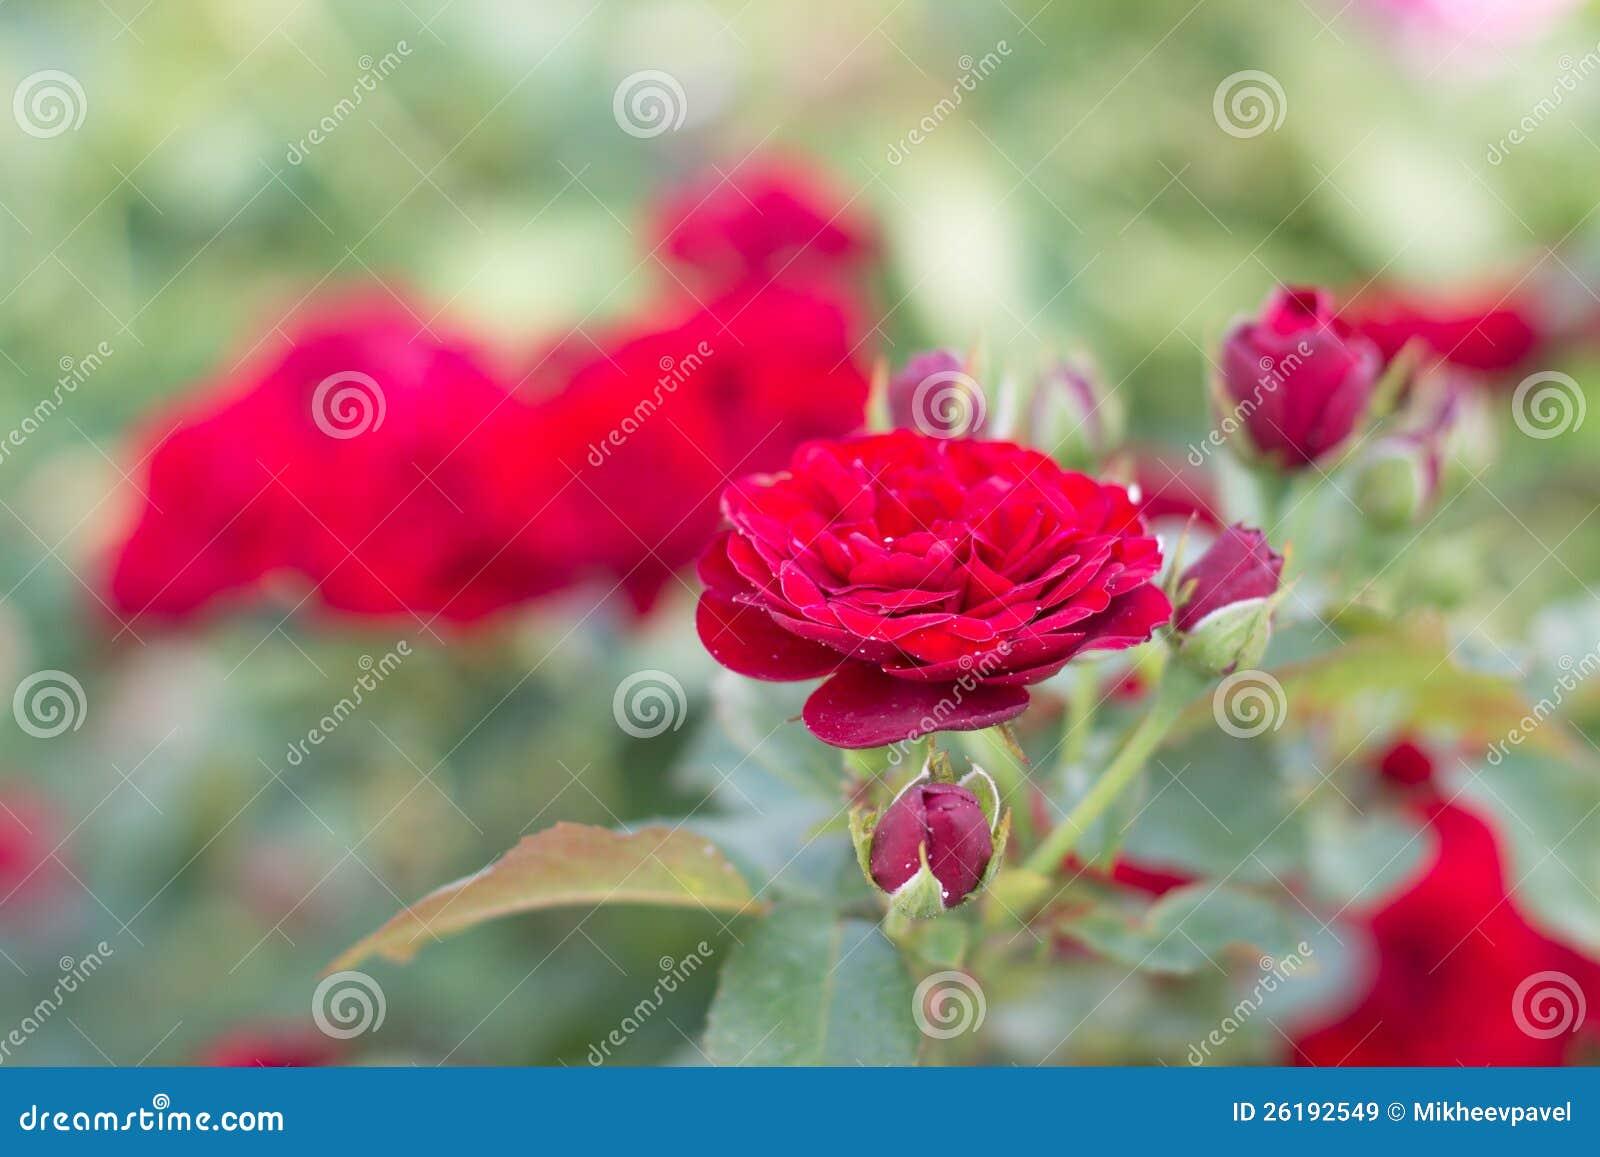 Photo of garden flowers roses